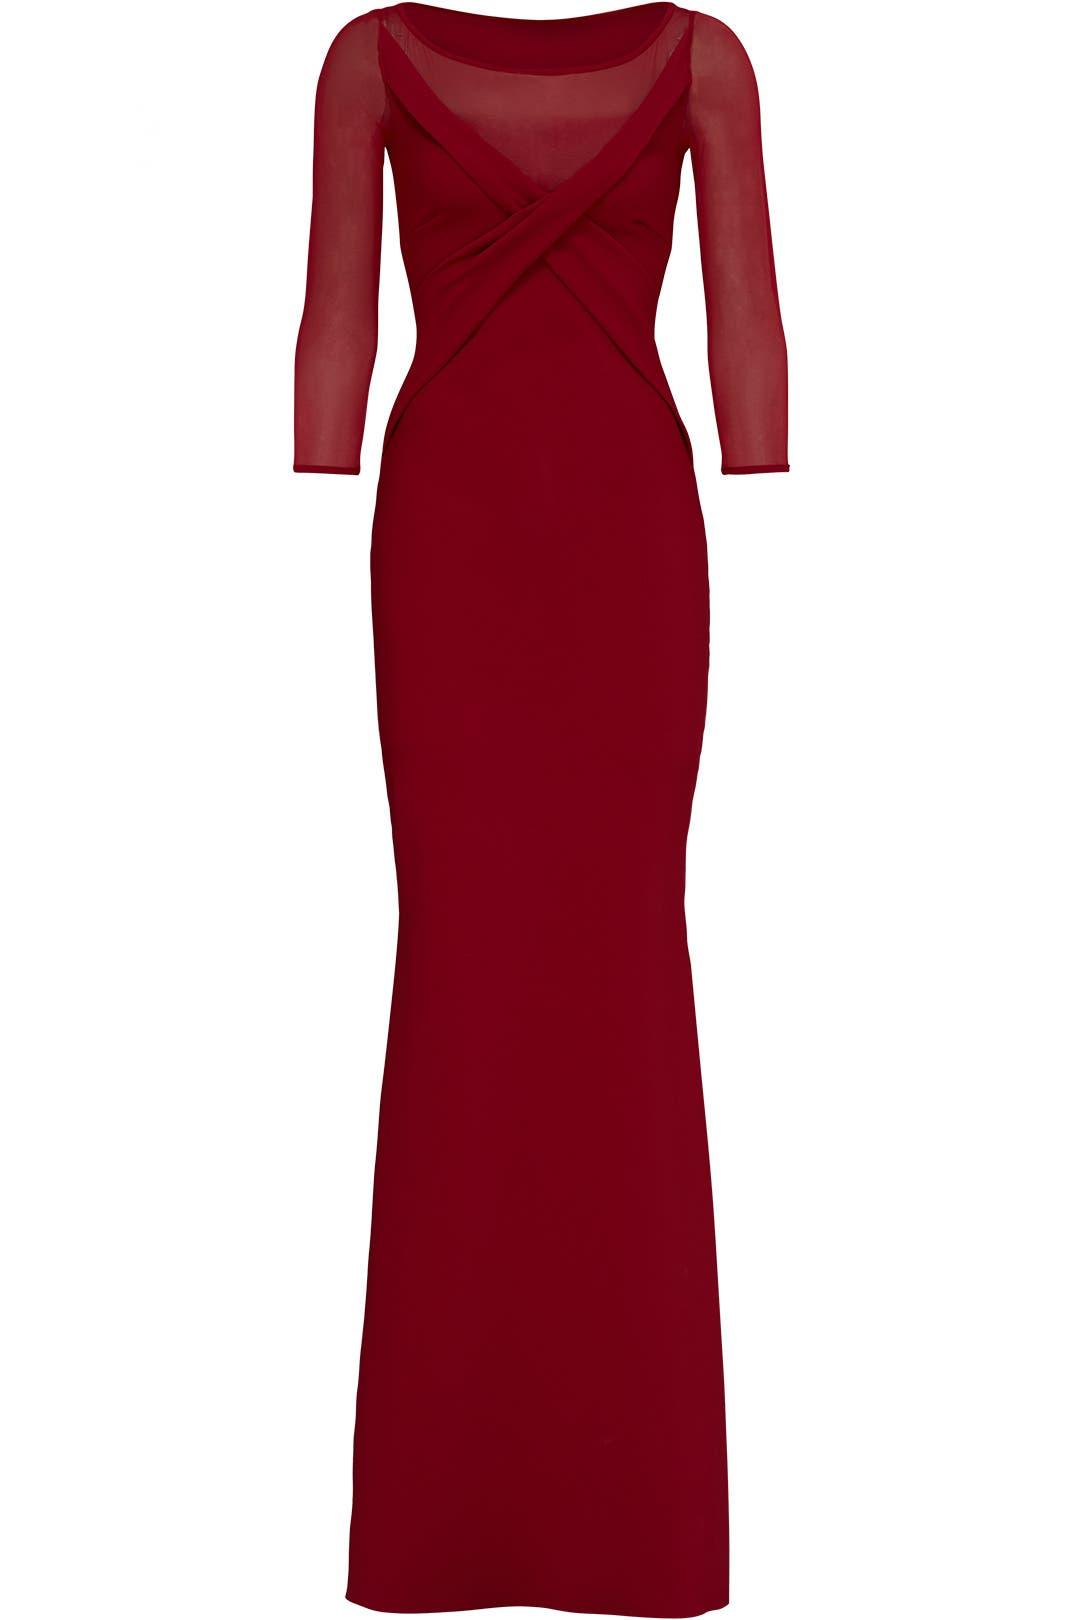 Alidora Gown by La Petite Robe di Chiara Boni for $130 - $150 | Rent ...